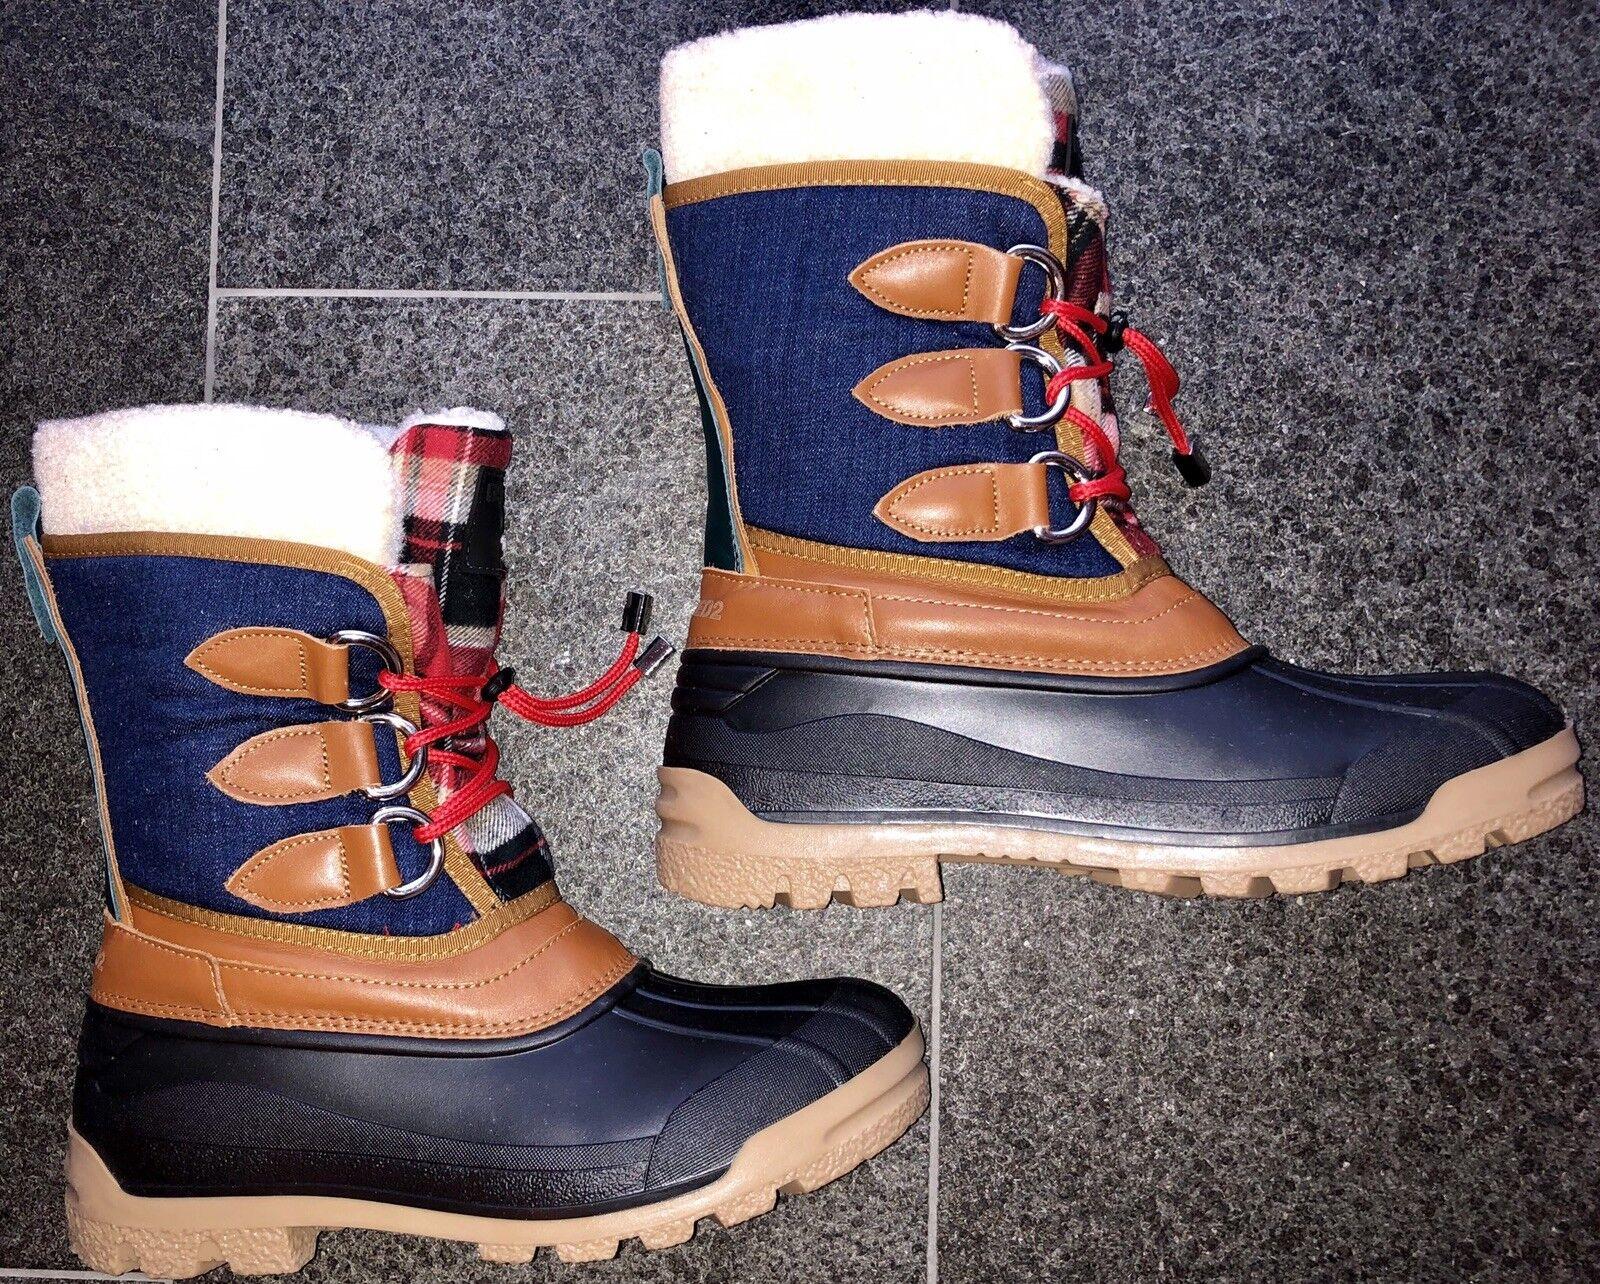 DSQUARED 2 F/W 2017 Ski Rain 41 42 Moon Boots Rain Moon Boots Sneakers Shoes